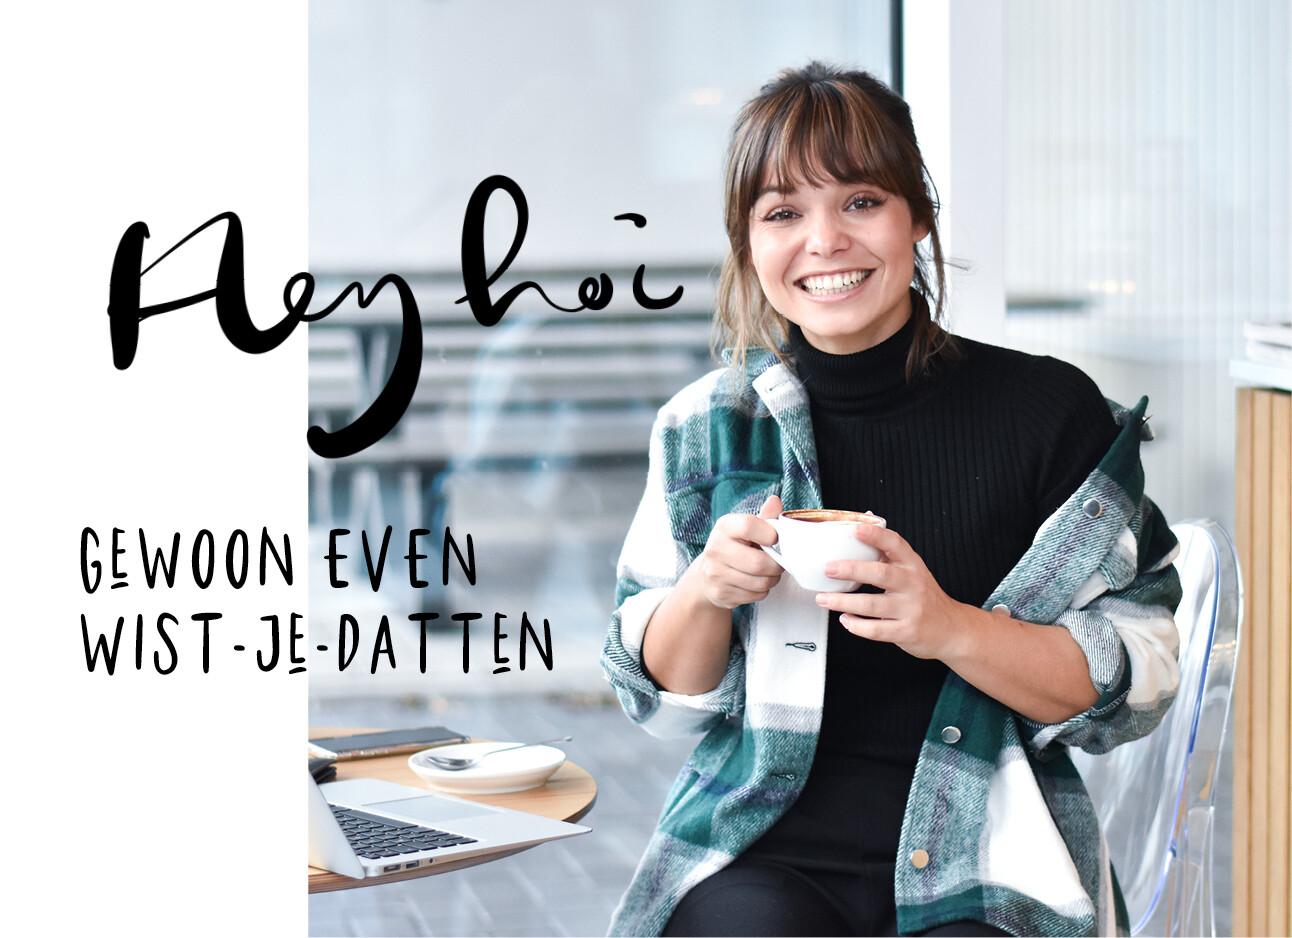 kiki lachend met koffie in haar handen